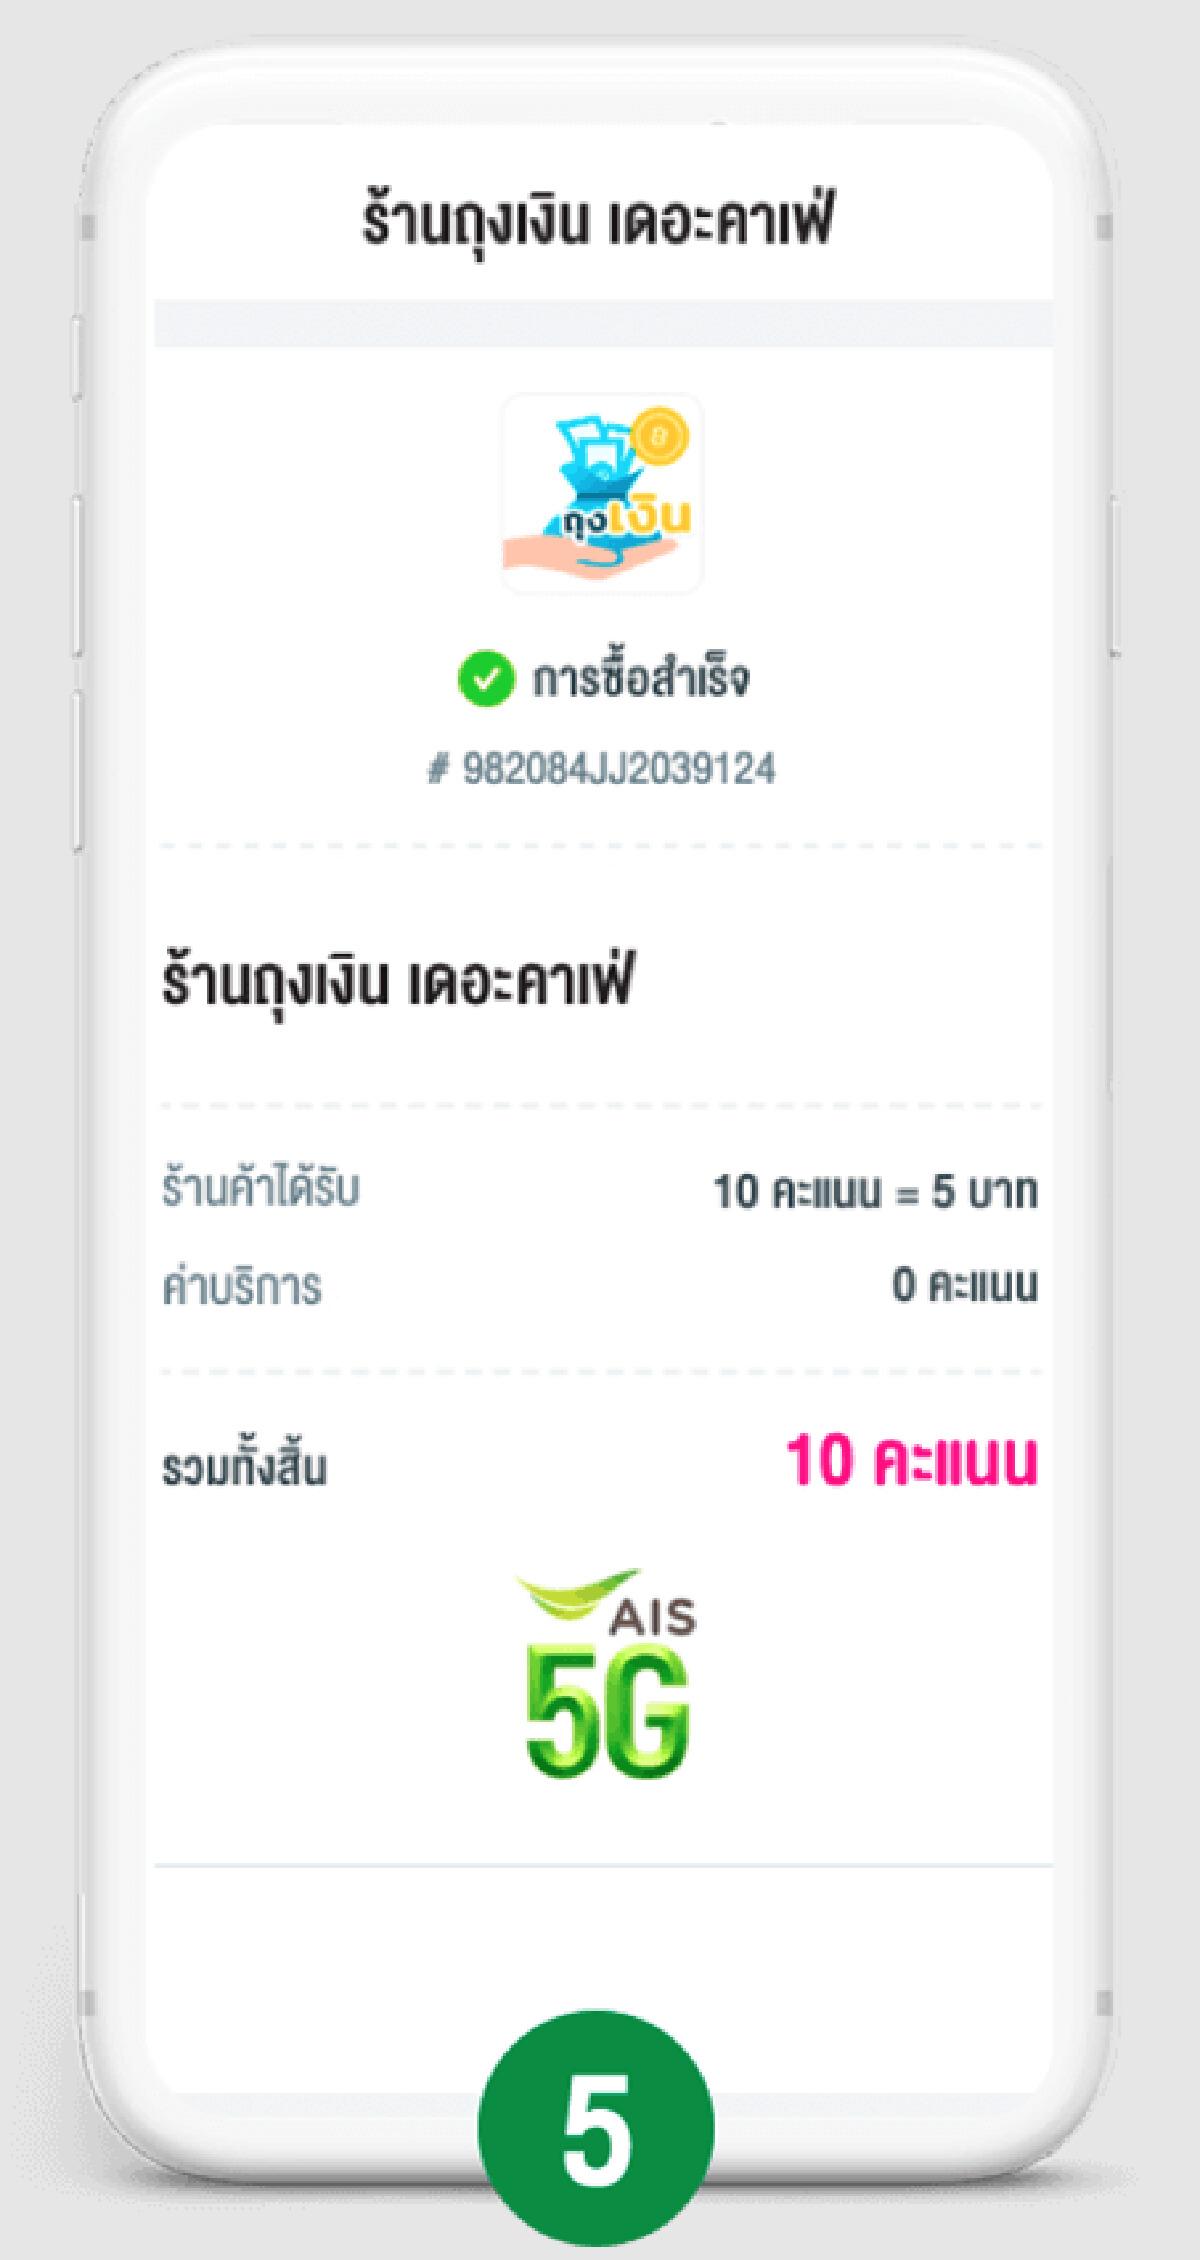 AIS Points, myAIS, พอยท์เพย์, เอไอเอส, ธนาคารกรุงไทย, ถุงเงิน